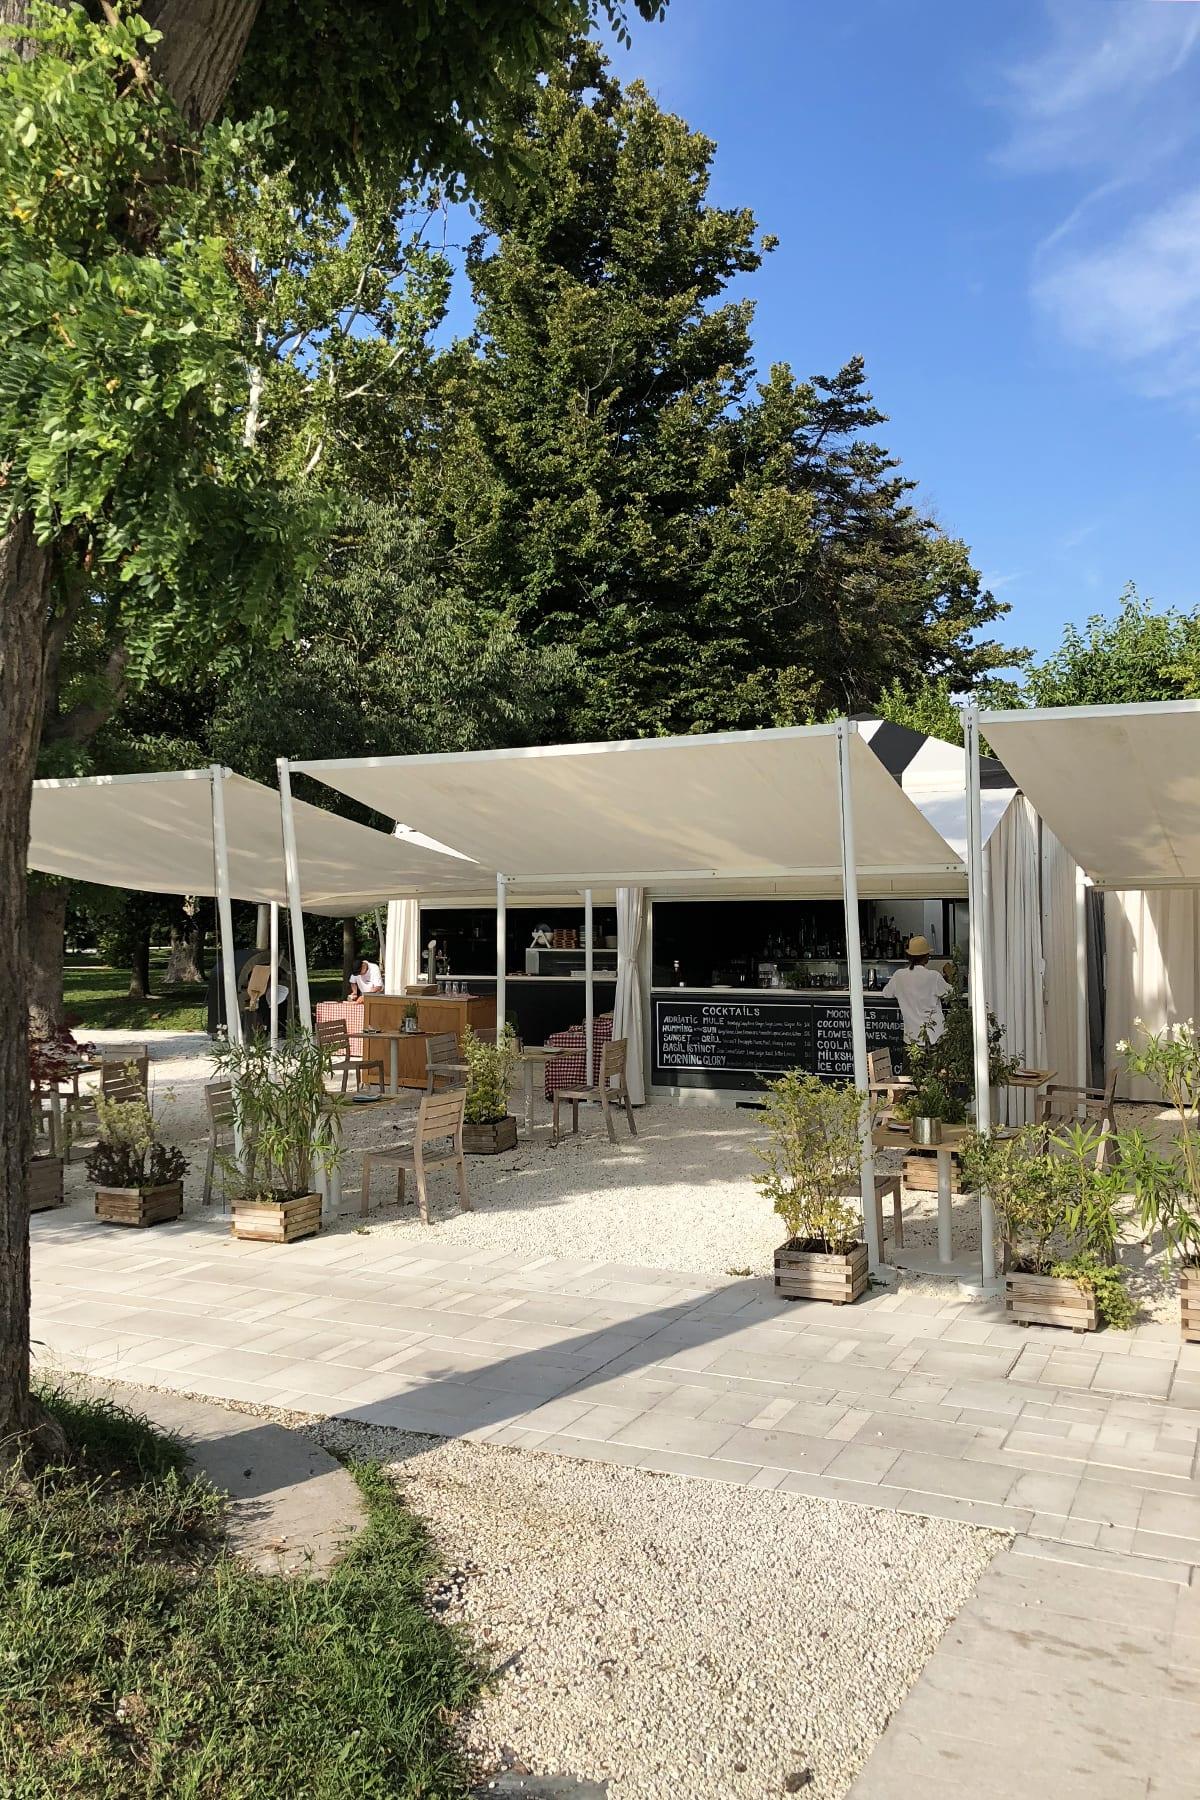 Jw marriott venice italy poolside restaurant family pool